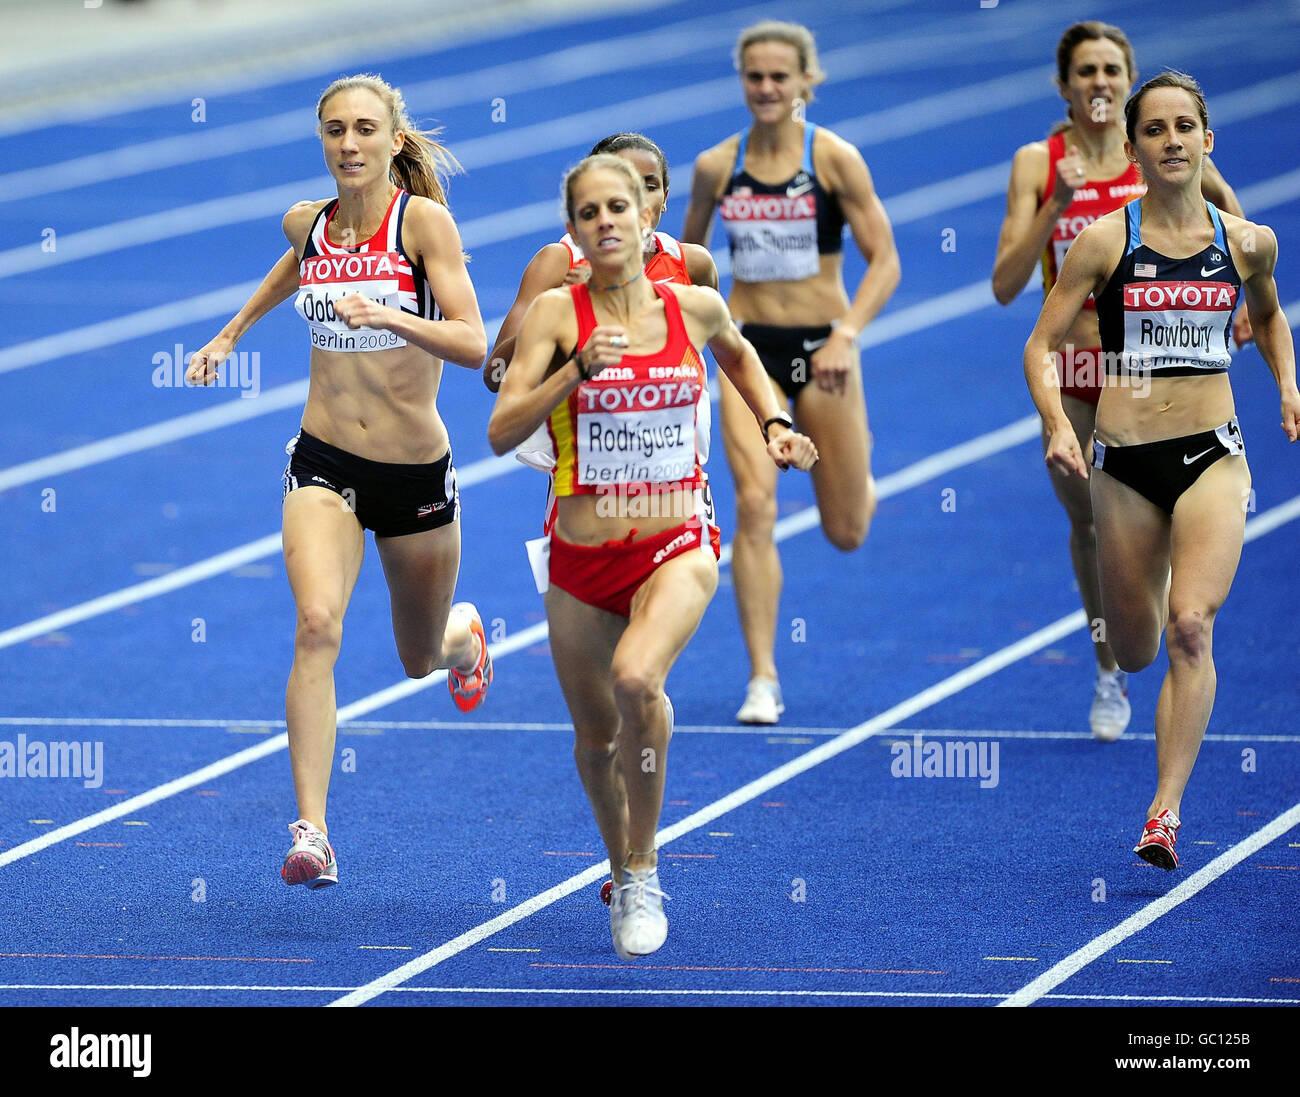 Athletics - IAAF World Athletics Championships - Day Nine - Berlin 2009 - Olympiastadion - Stock Image